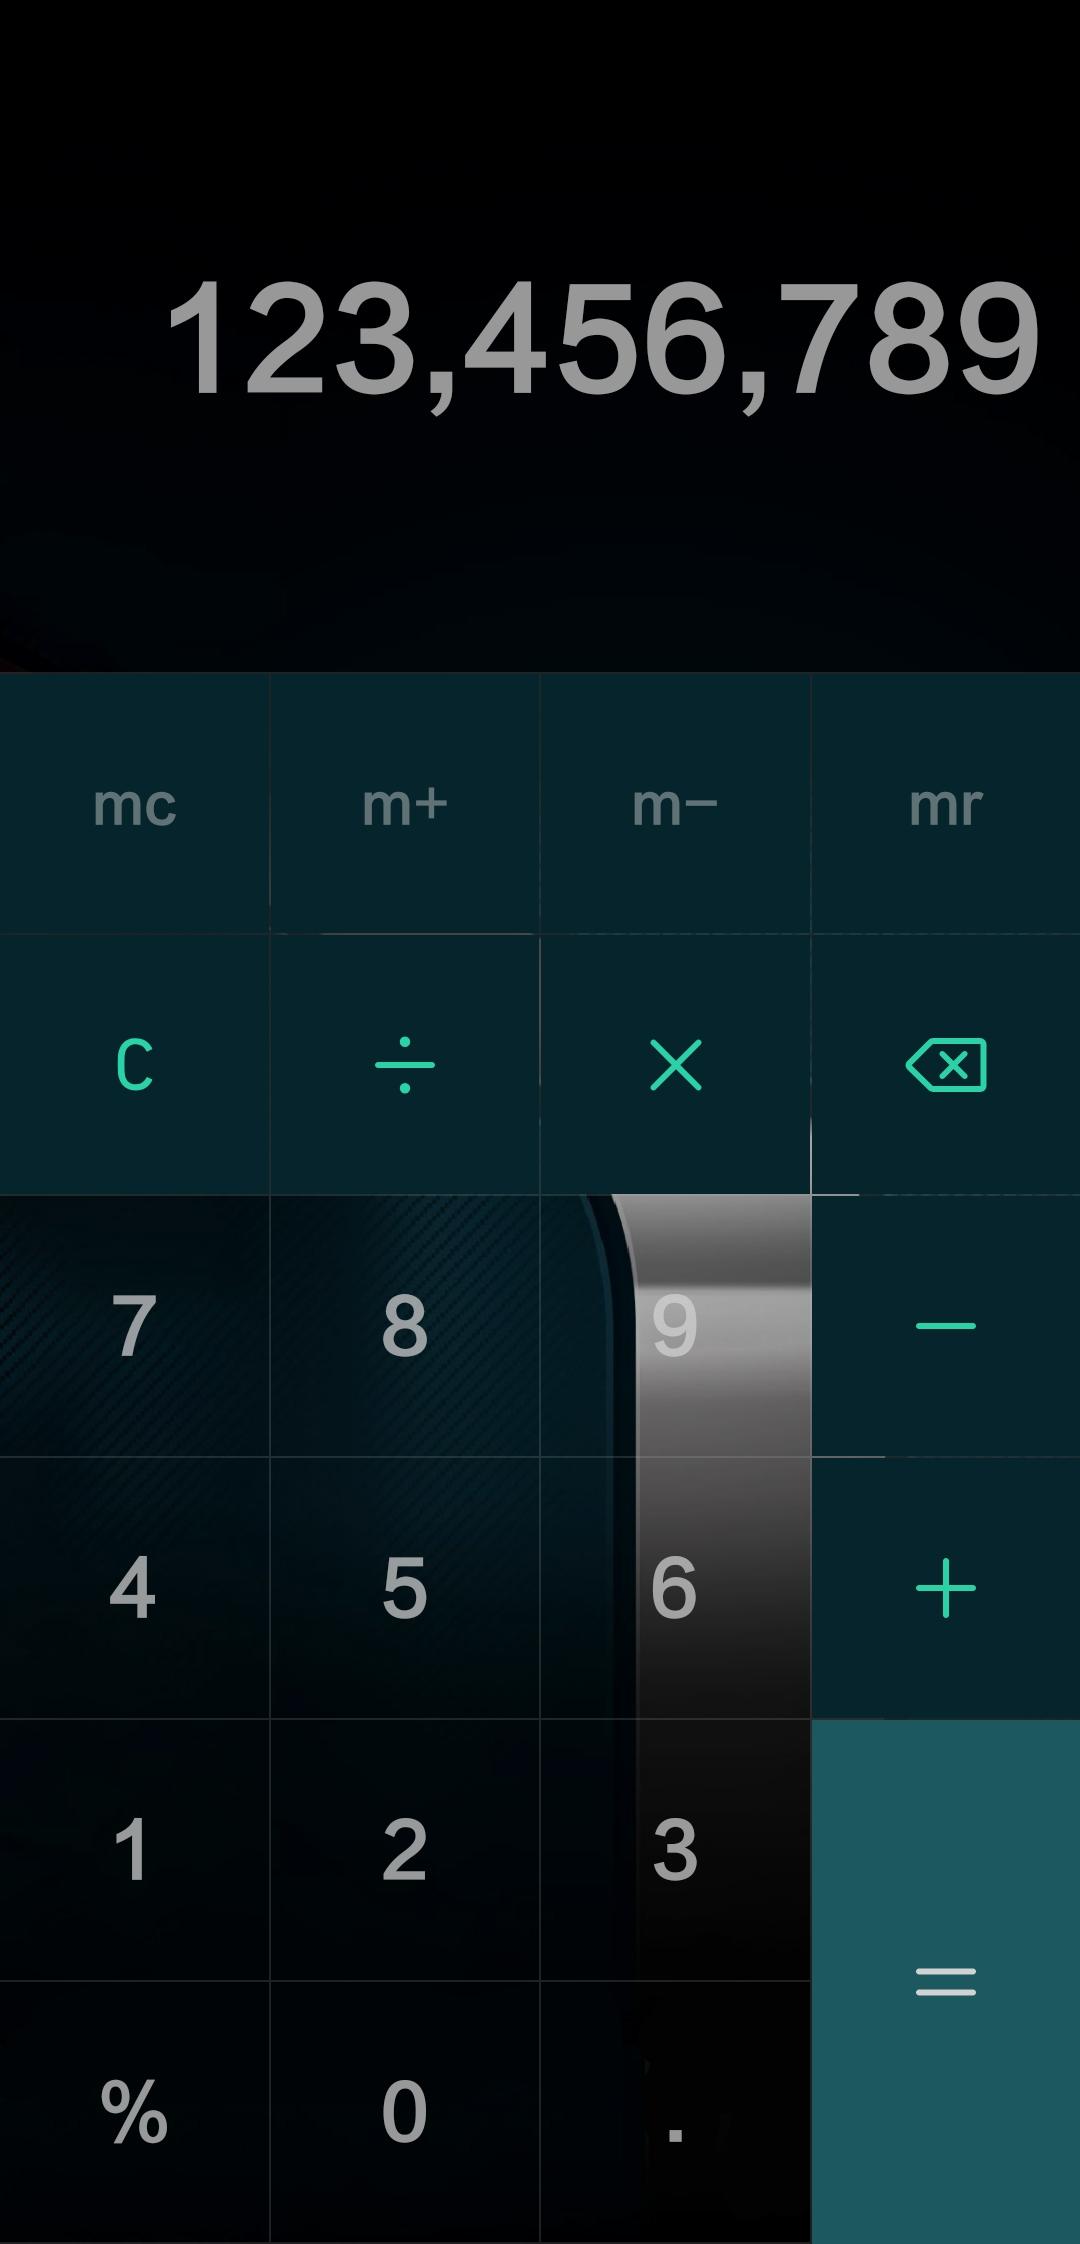 Screenshot_20190623_144216_com.android.calculator2.jpg